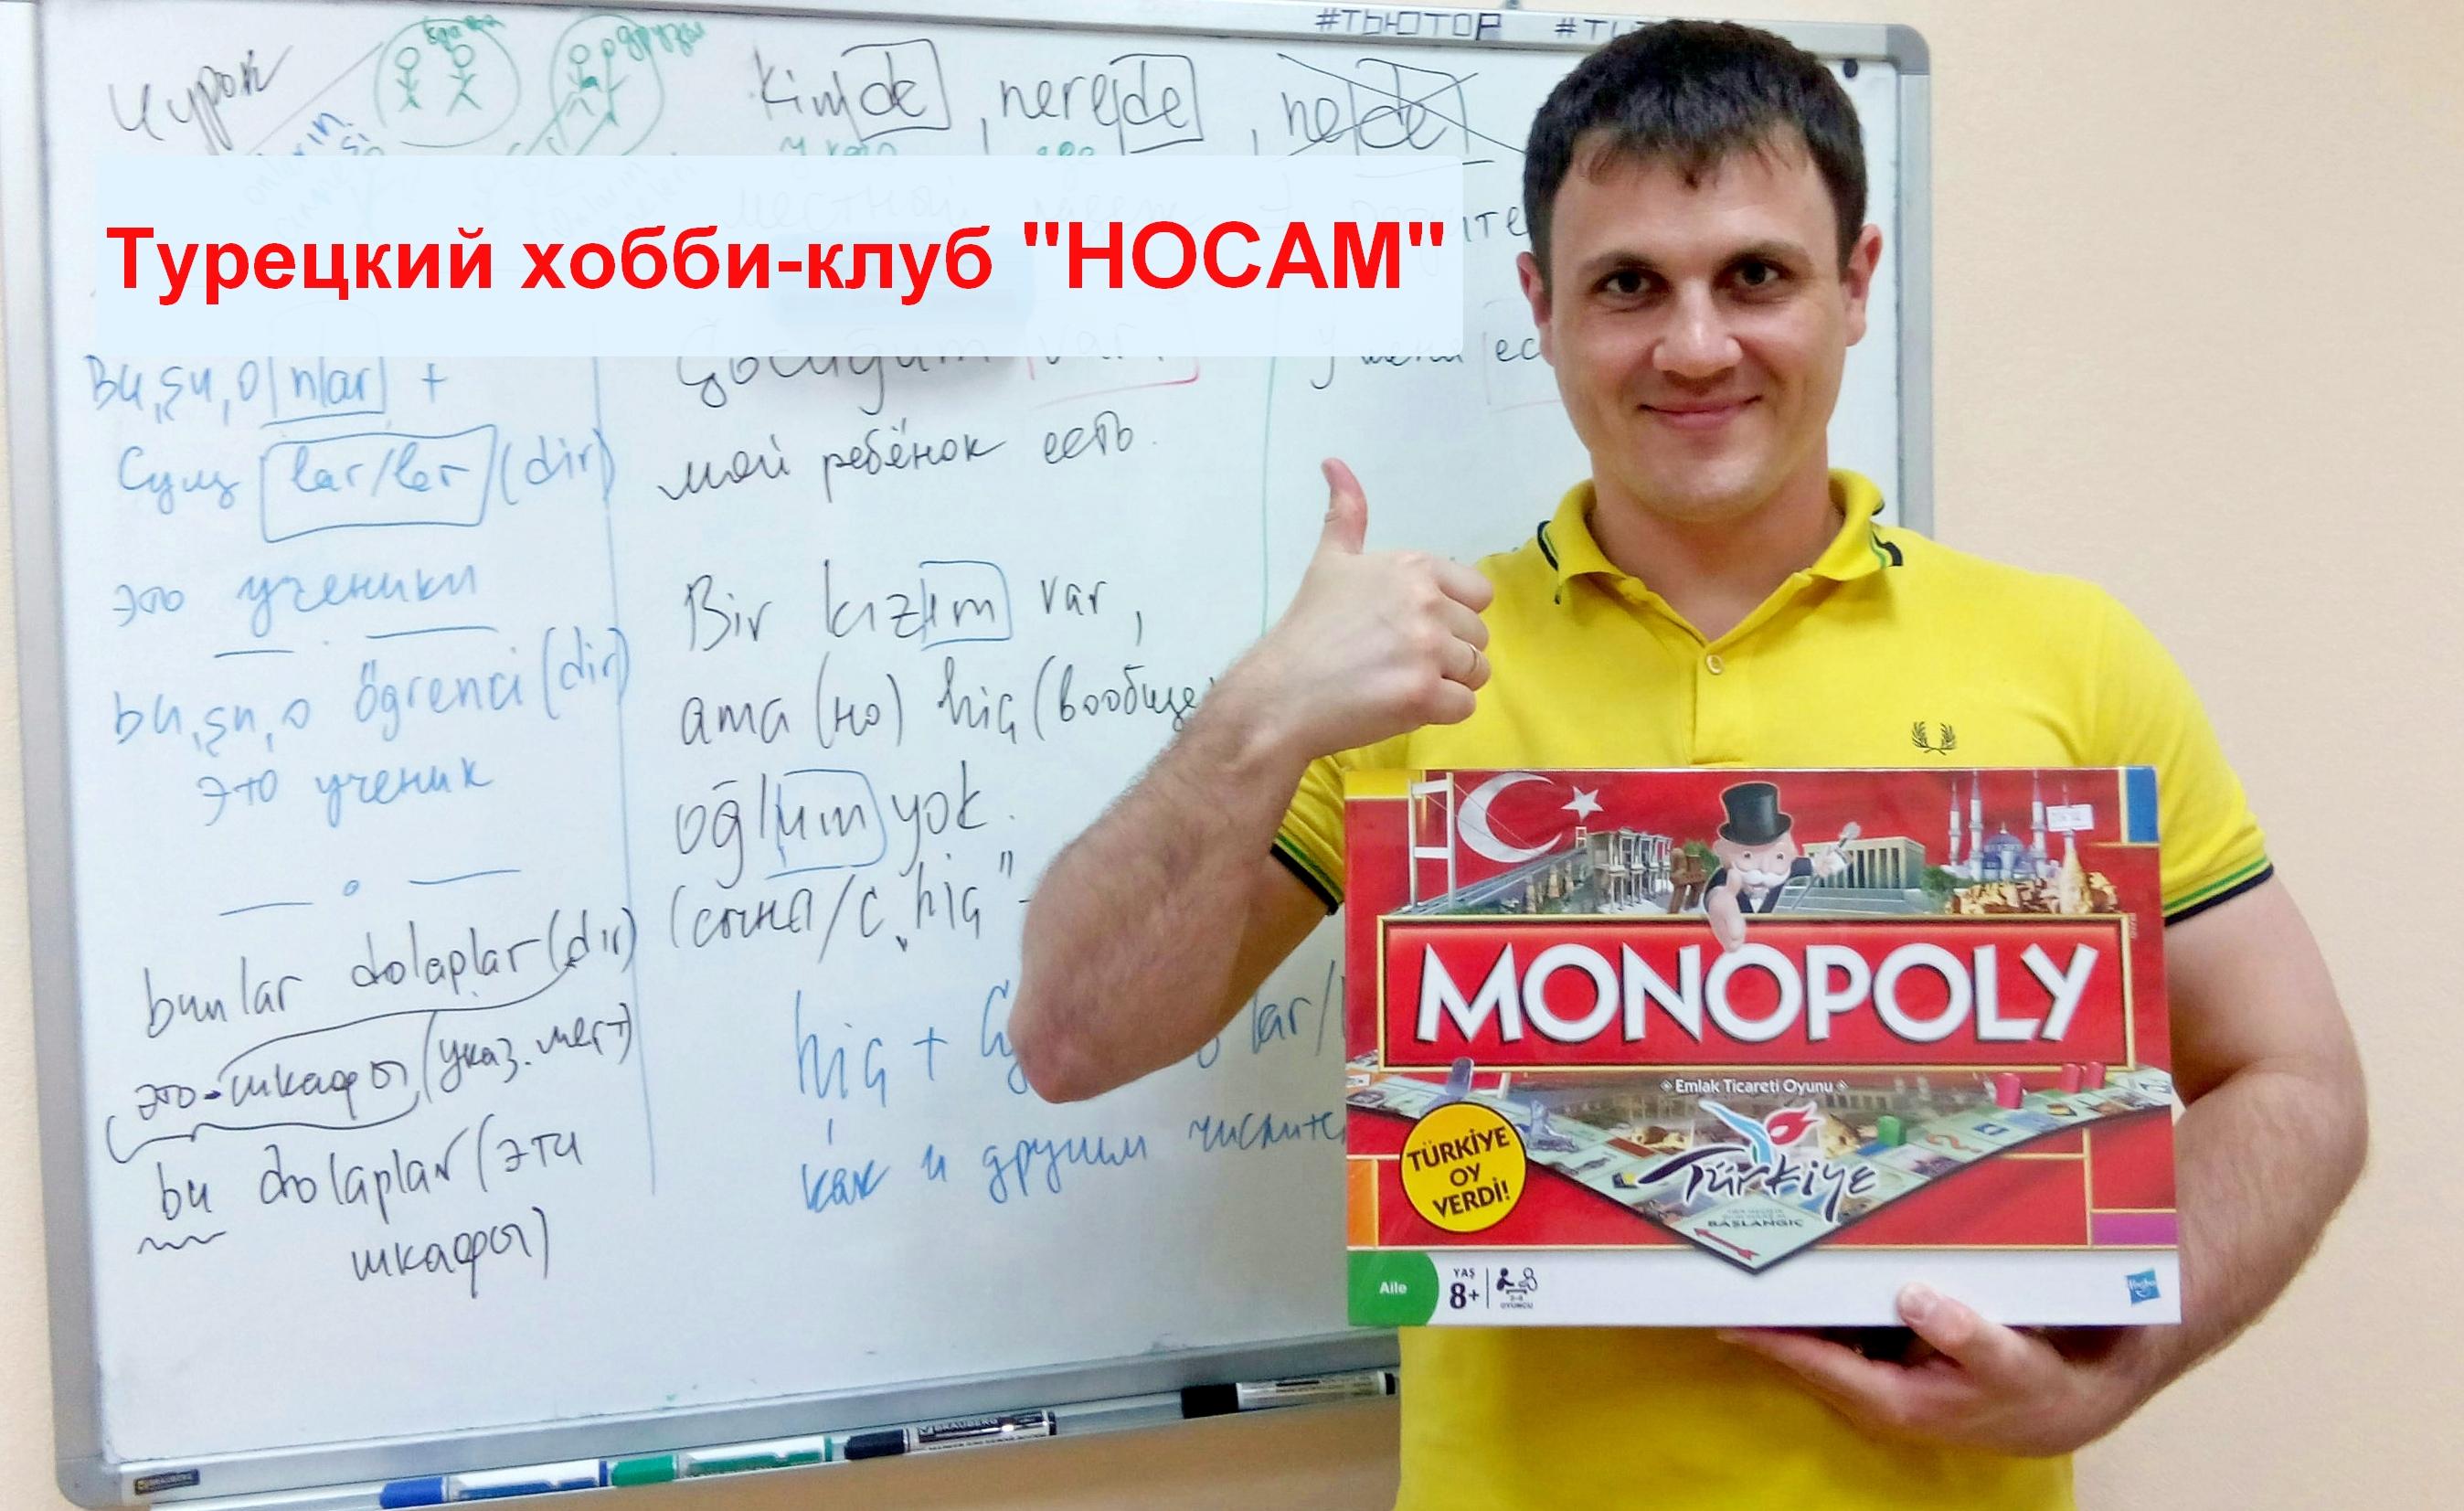 турецкий клуб Hocam